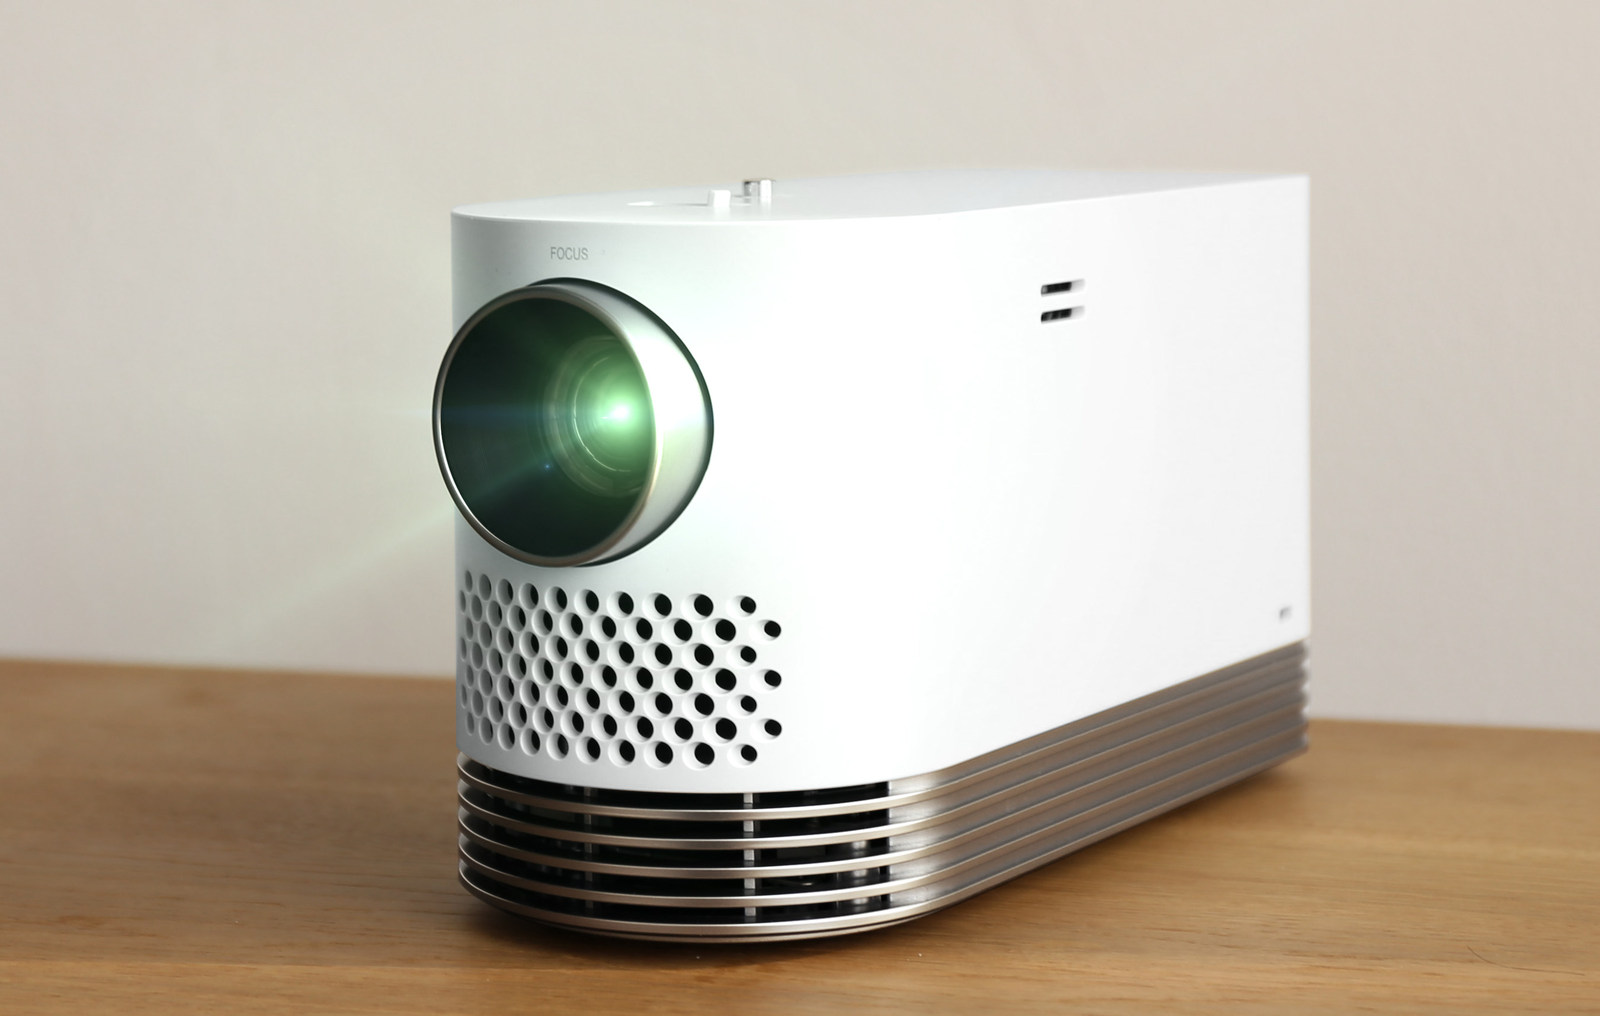 LG_ProBeam_Projector.jpg?w=1600